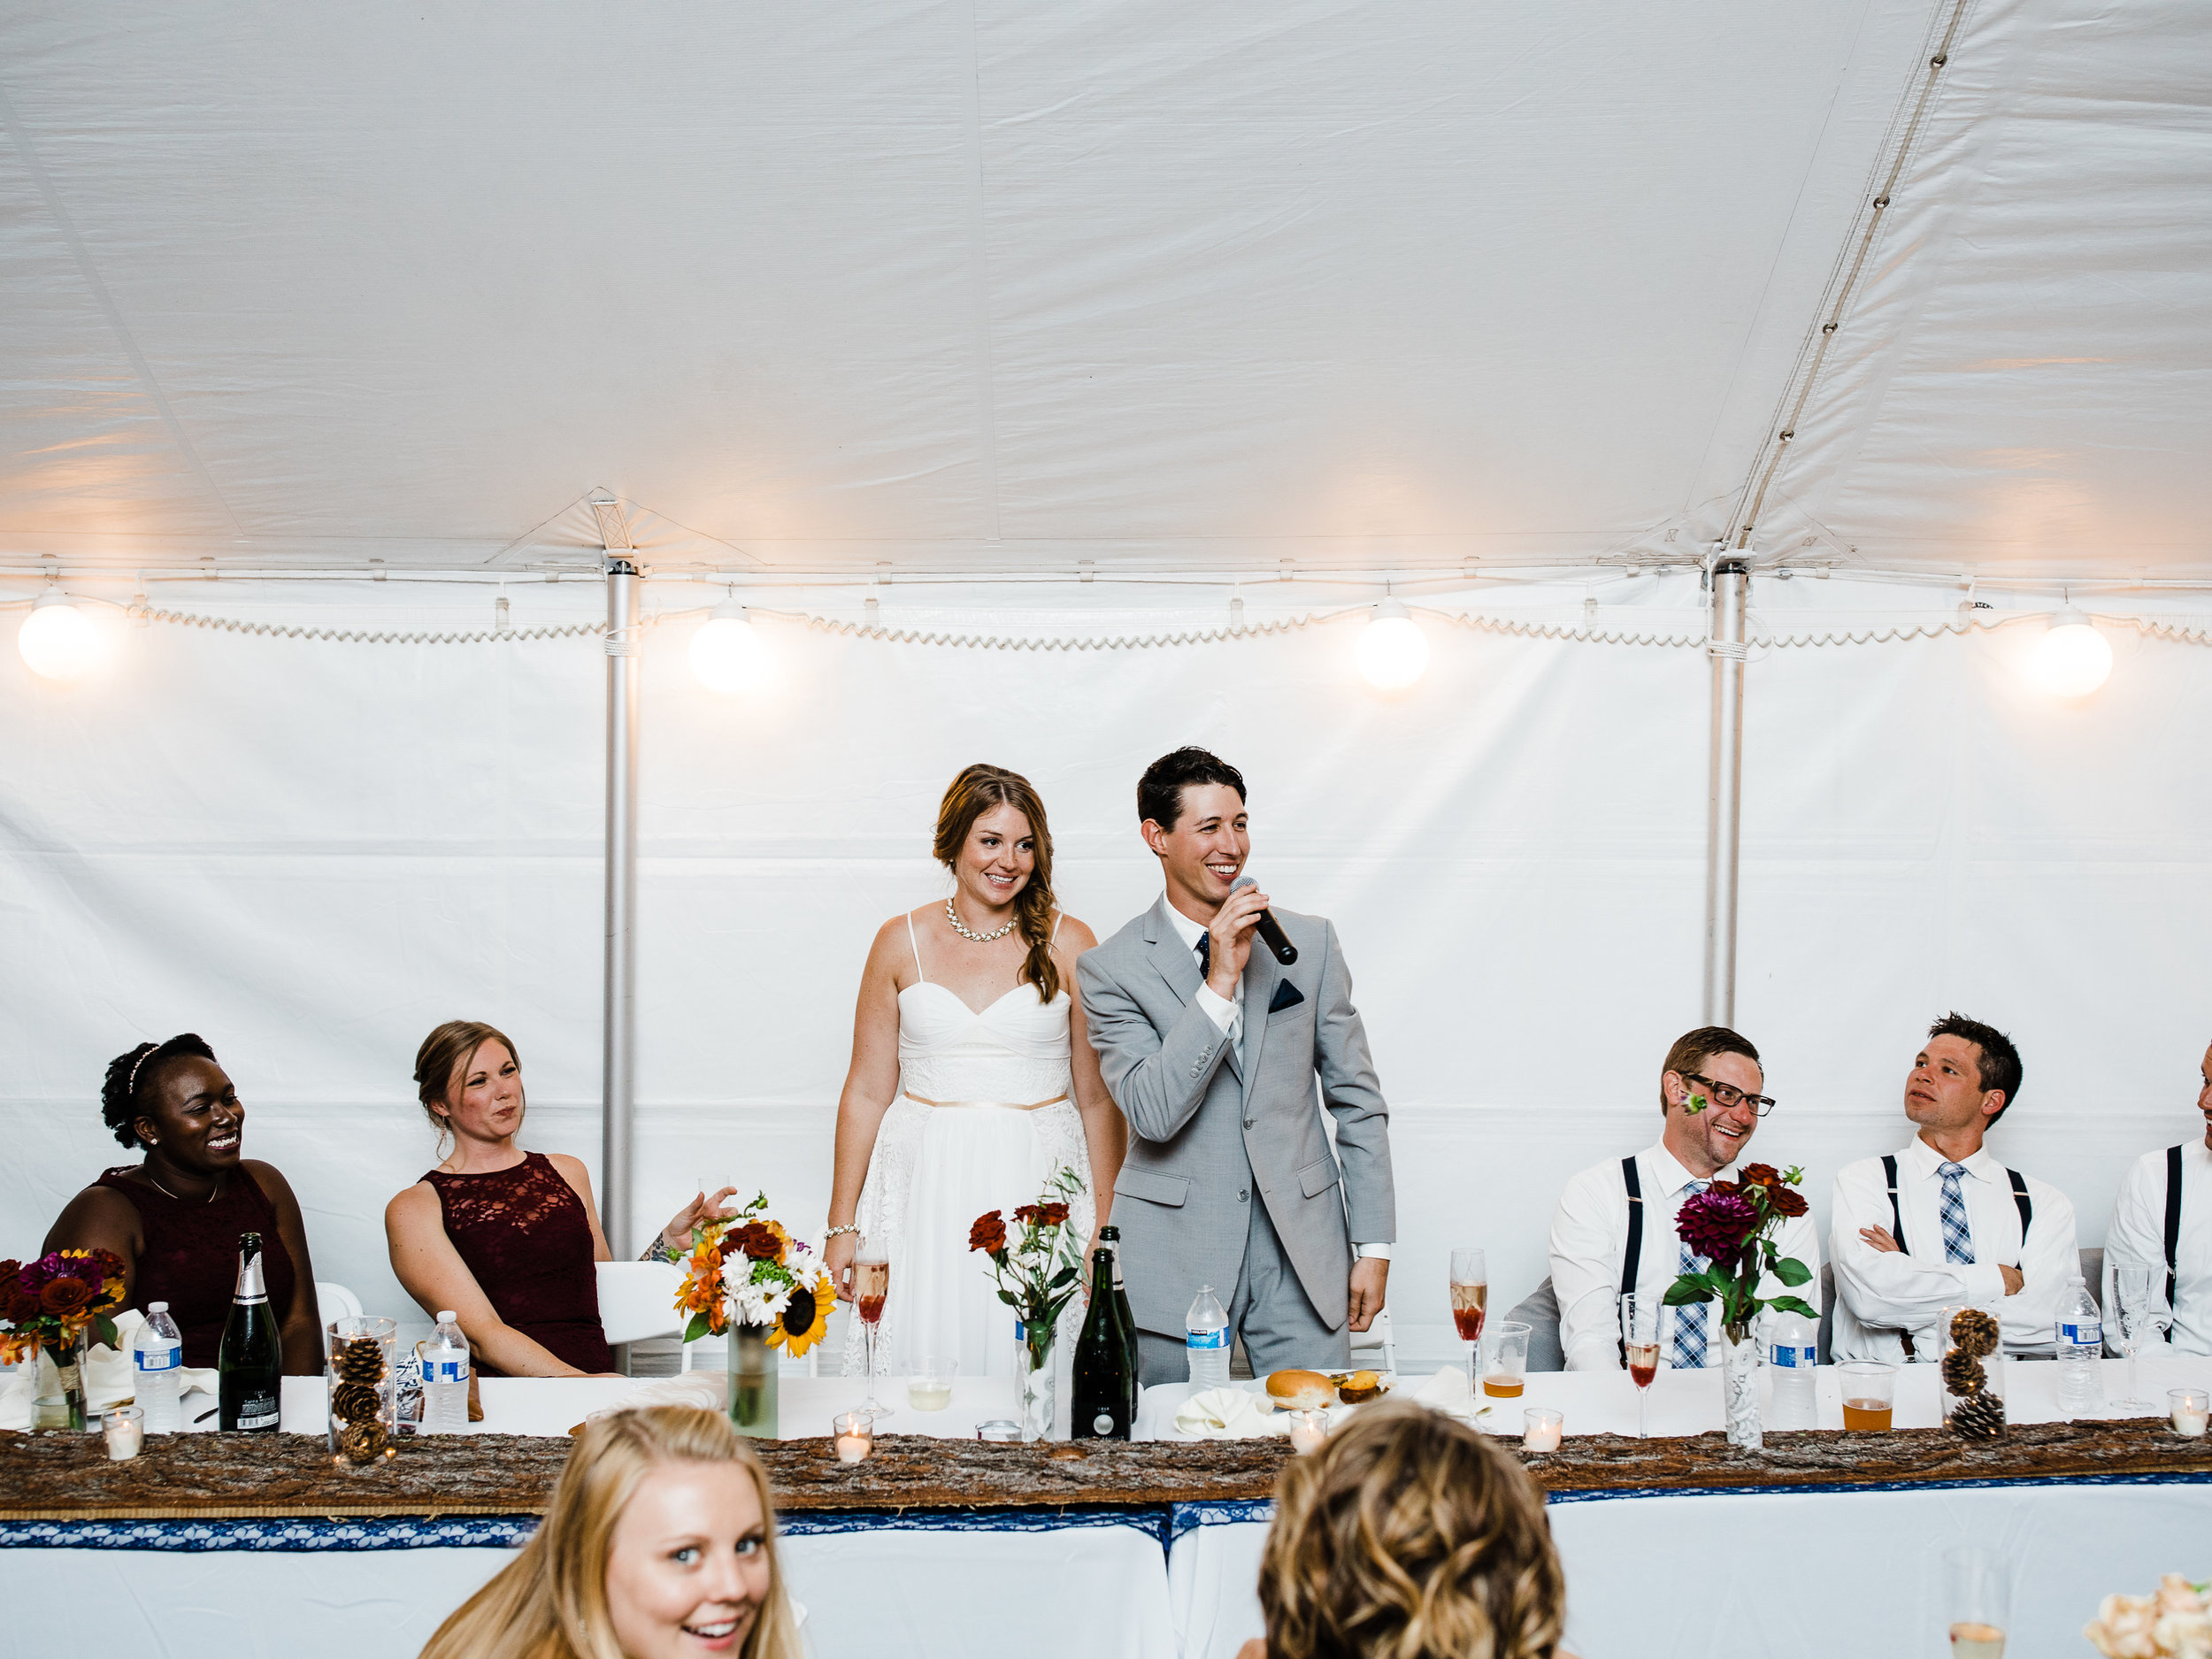 Northern Minnesota lakeside destination wedding reception in tent.